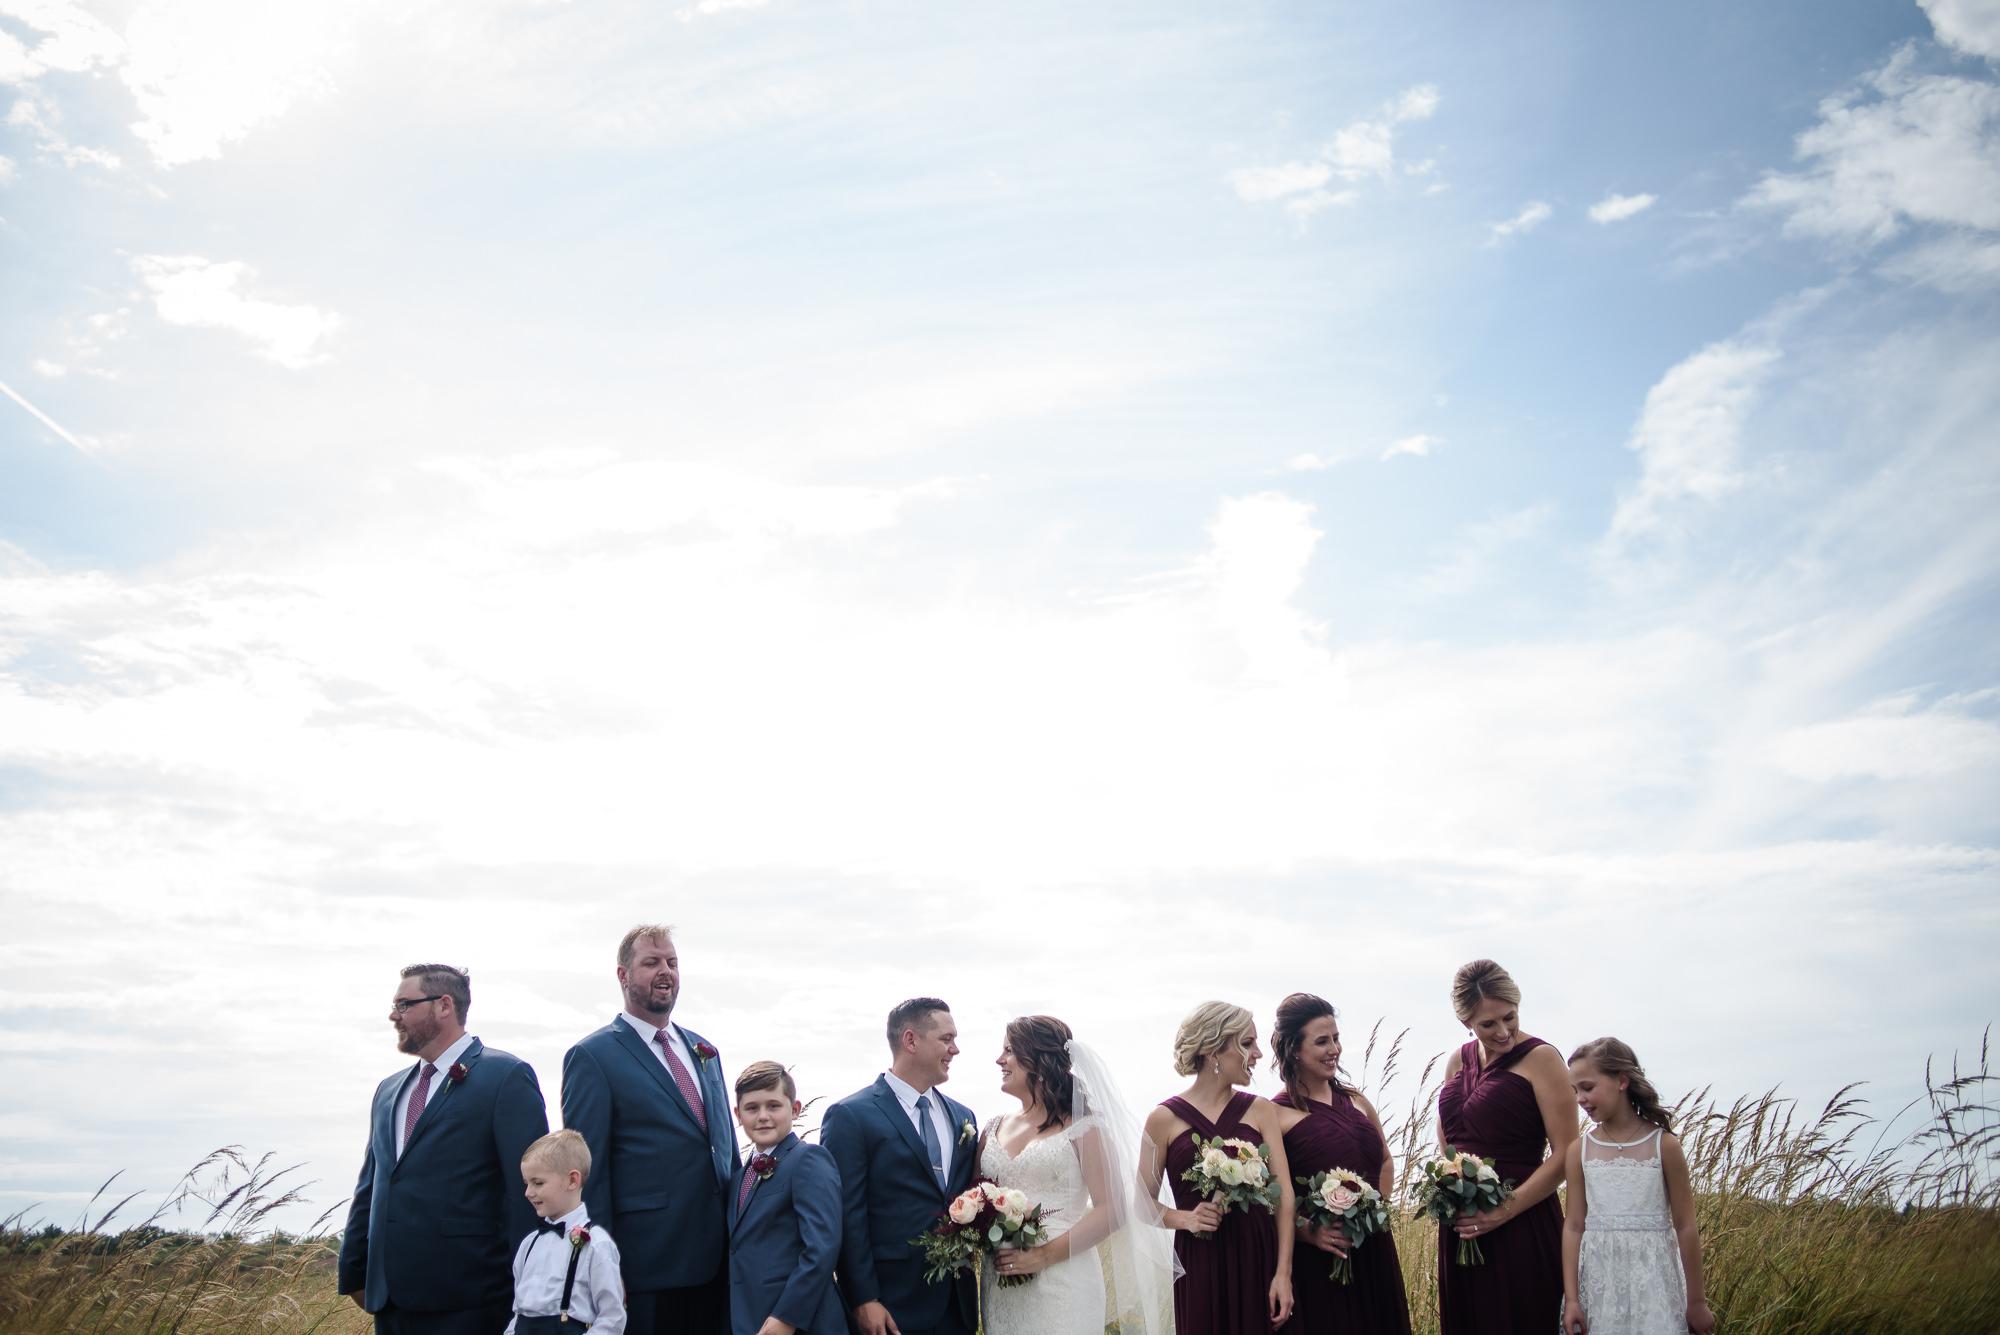 KEVIN-STACY-NOAHS-EVENT-VENUE-OMAHA-WEDDING-PHOTOGRAPHER-013.jpg